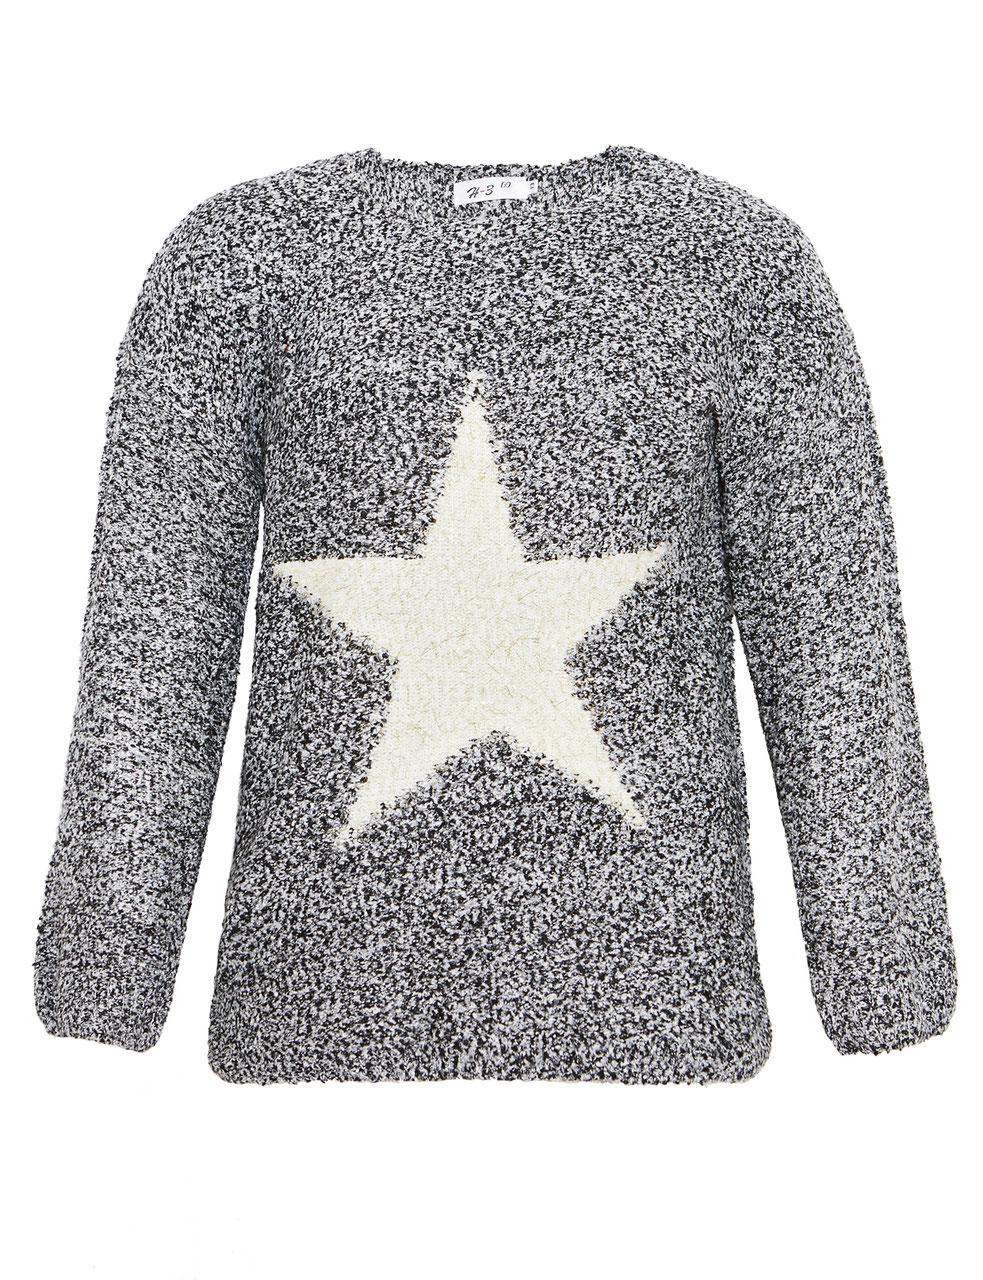 buy popular e8e00 b7f4d weicher Pullover mit Stern